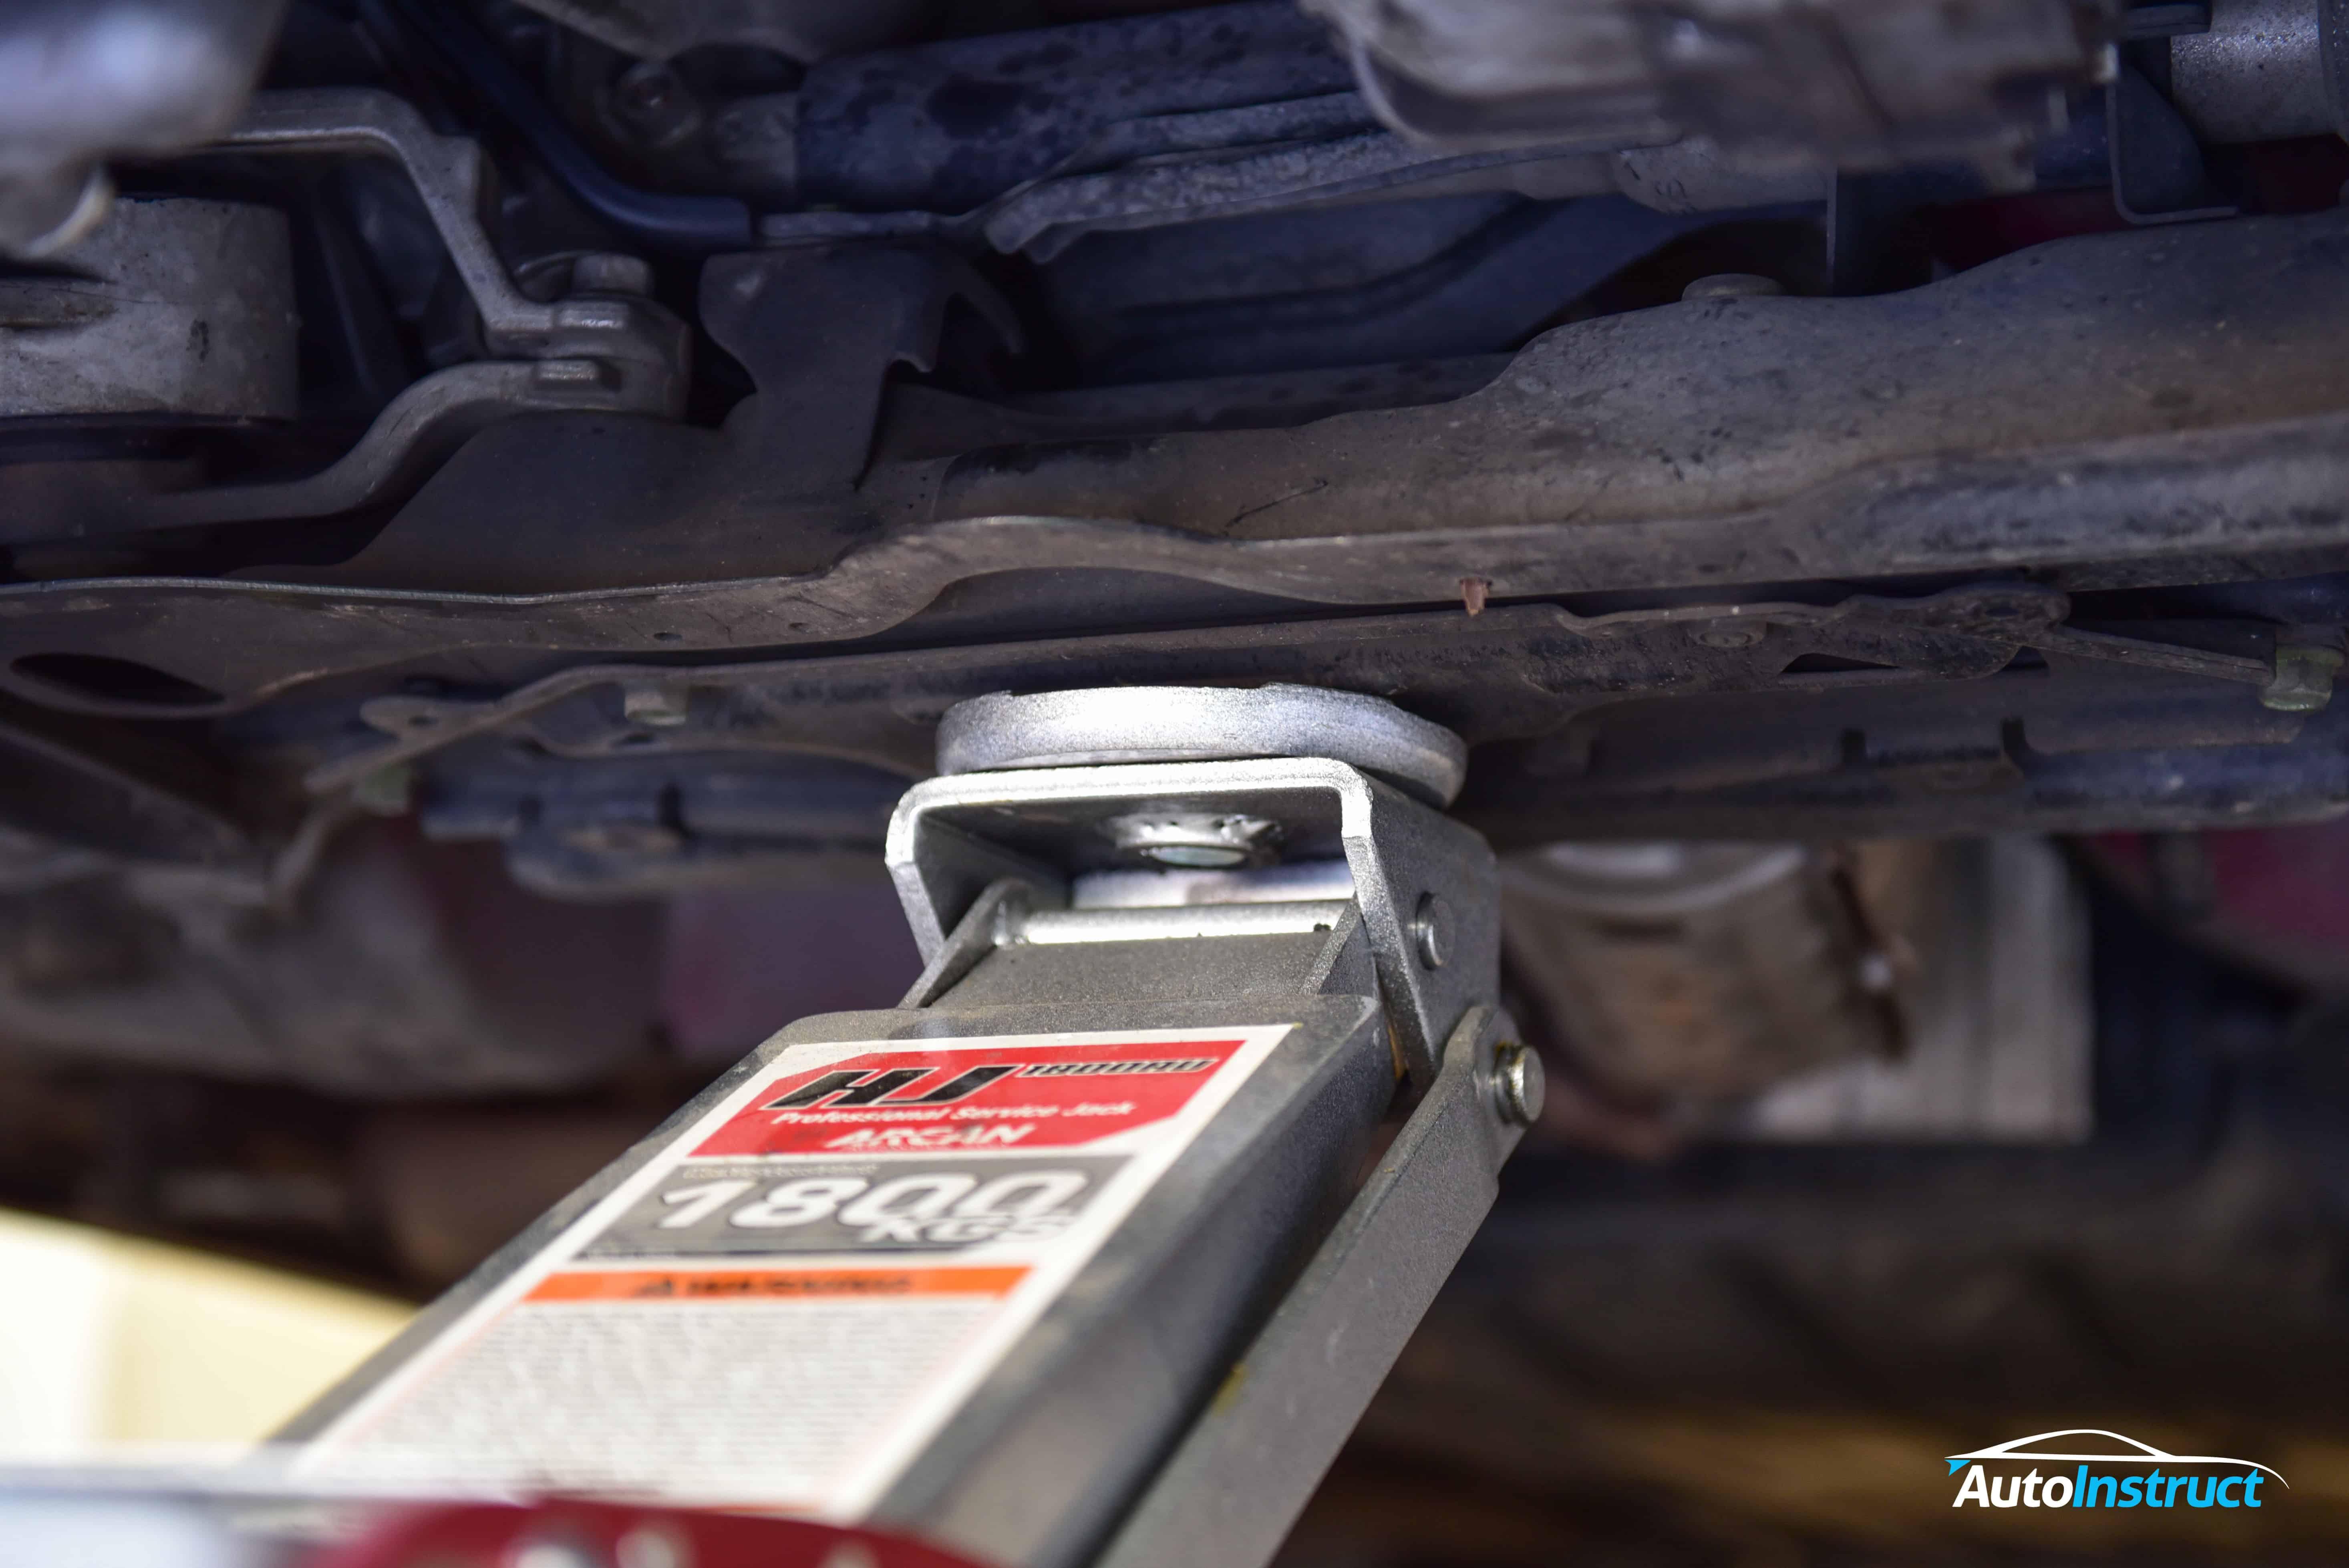 Honda Civic (FN) Jacking Points